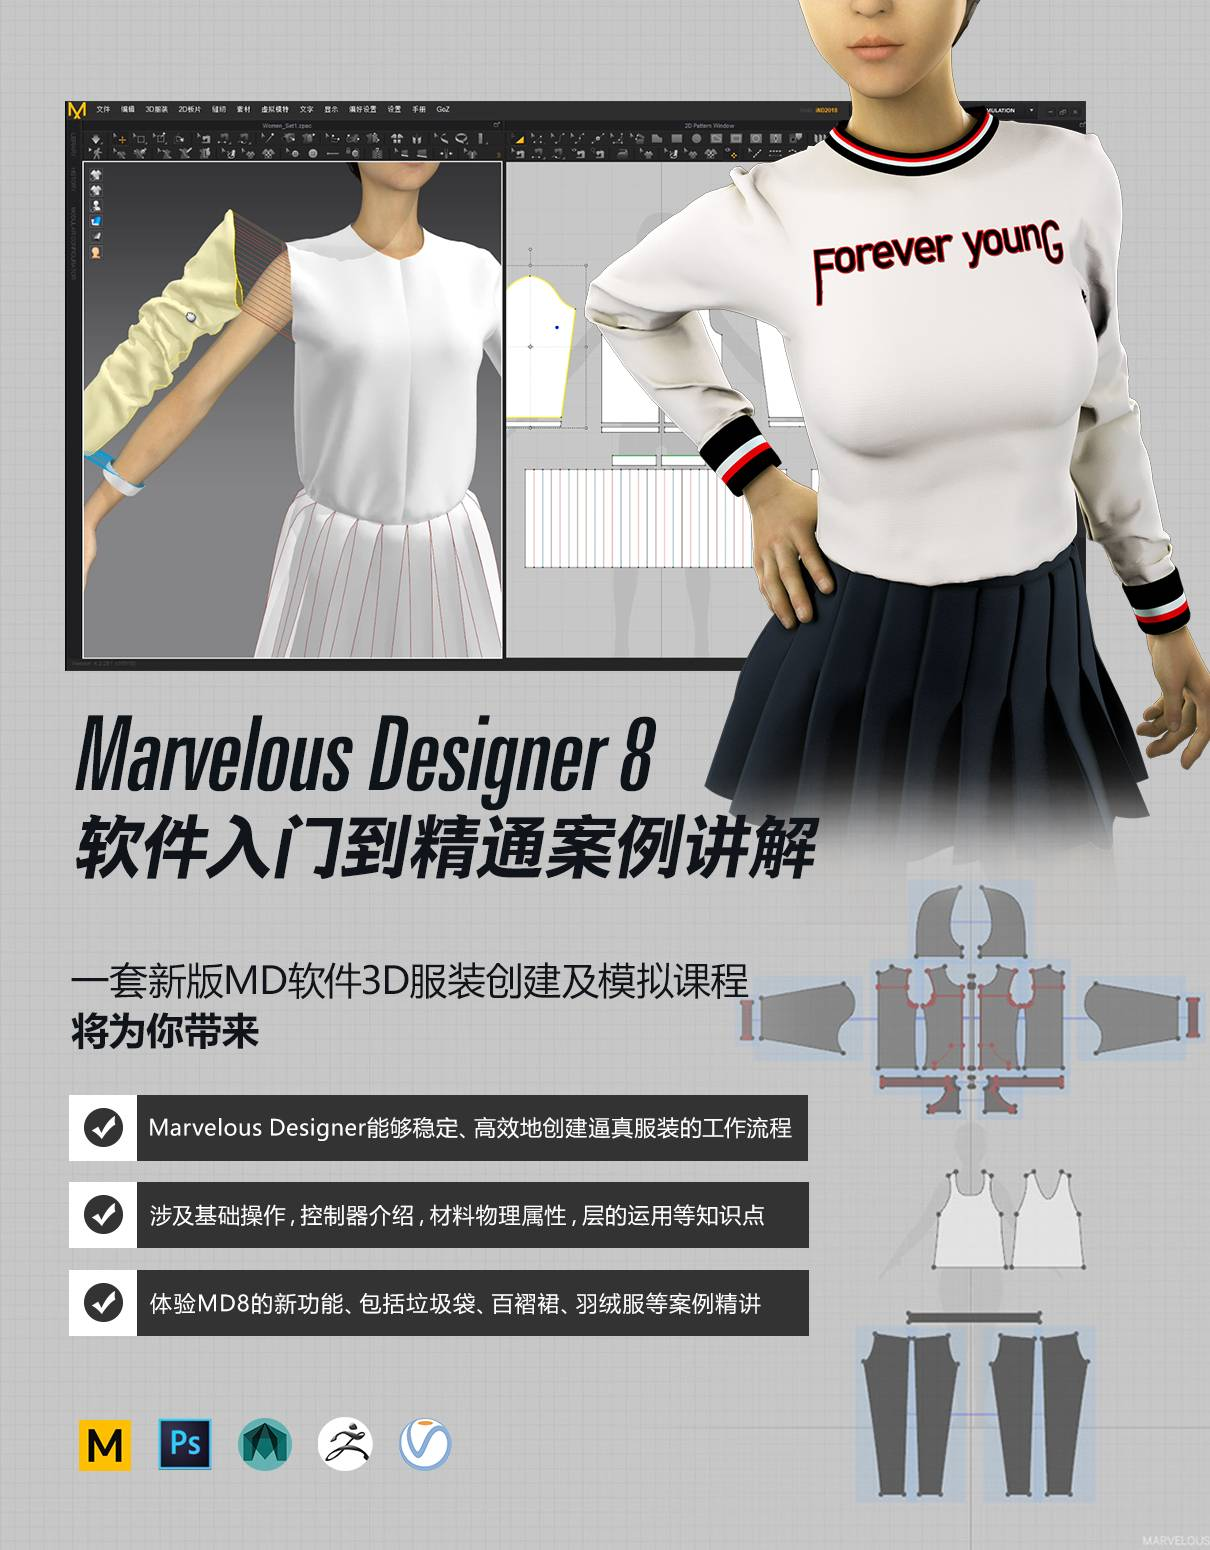 Marvelous Designer 7 服装软件破解版-FANCHENBIZ